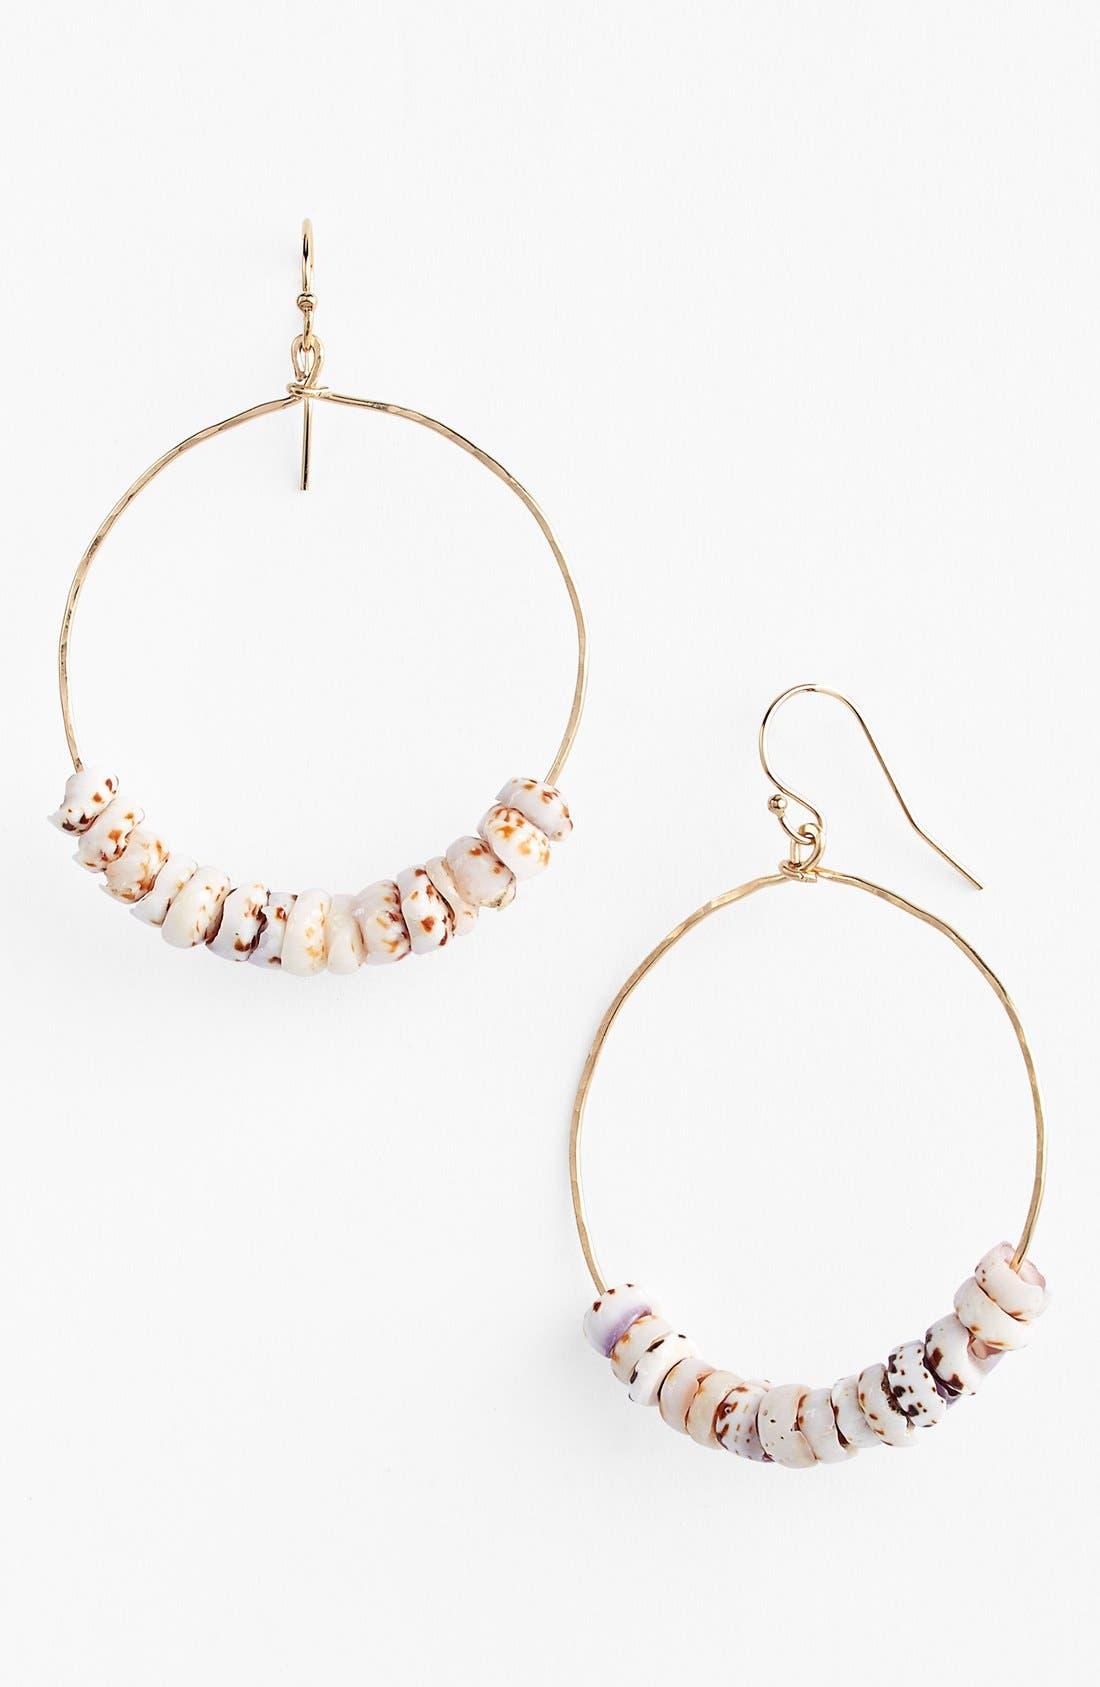 'Manini' Puka Shell Frontal Hoop Earrings